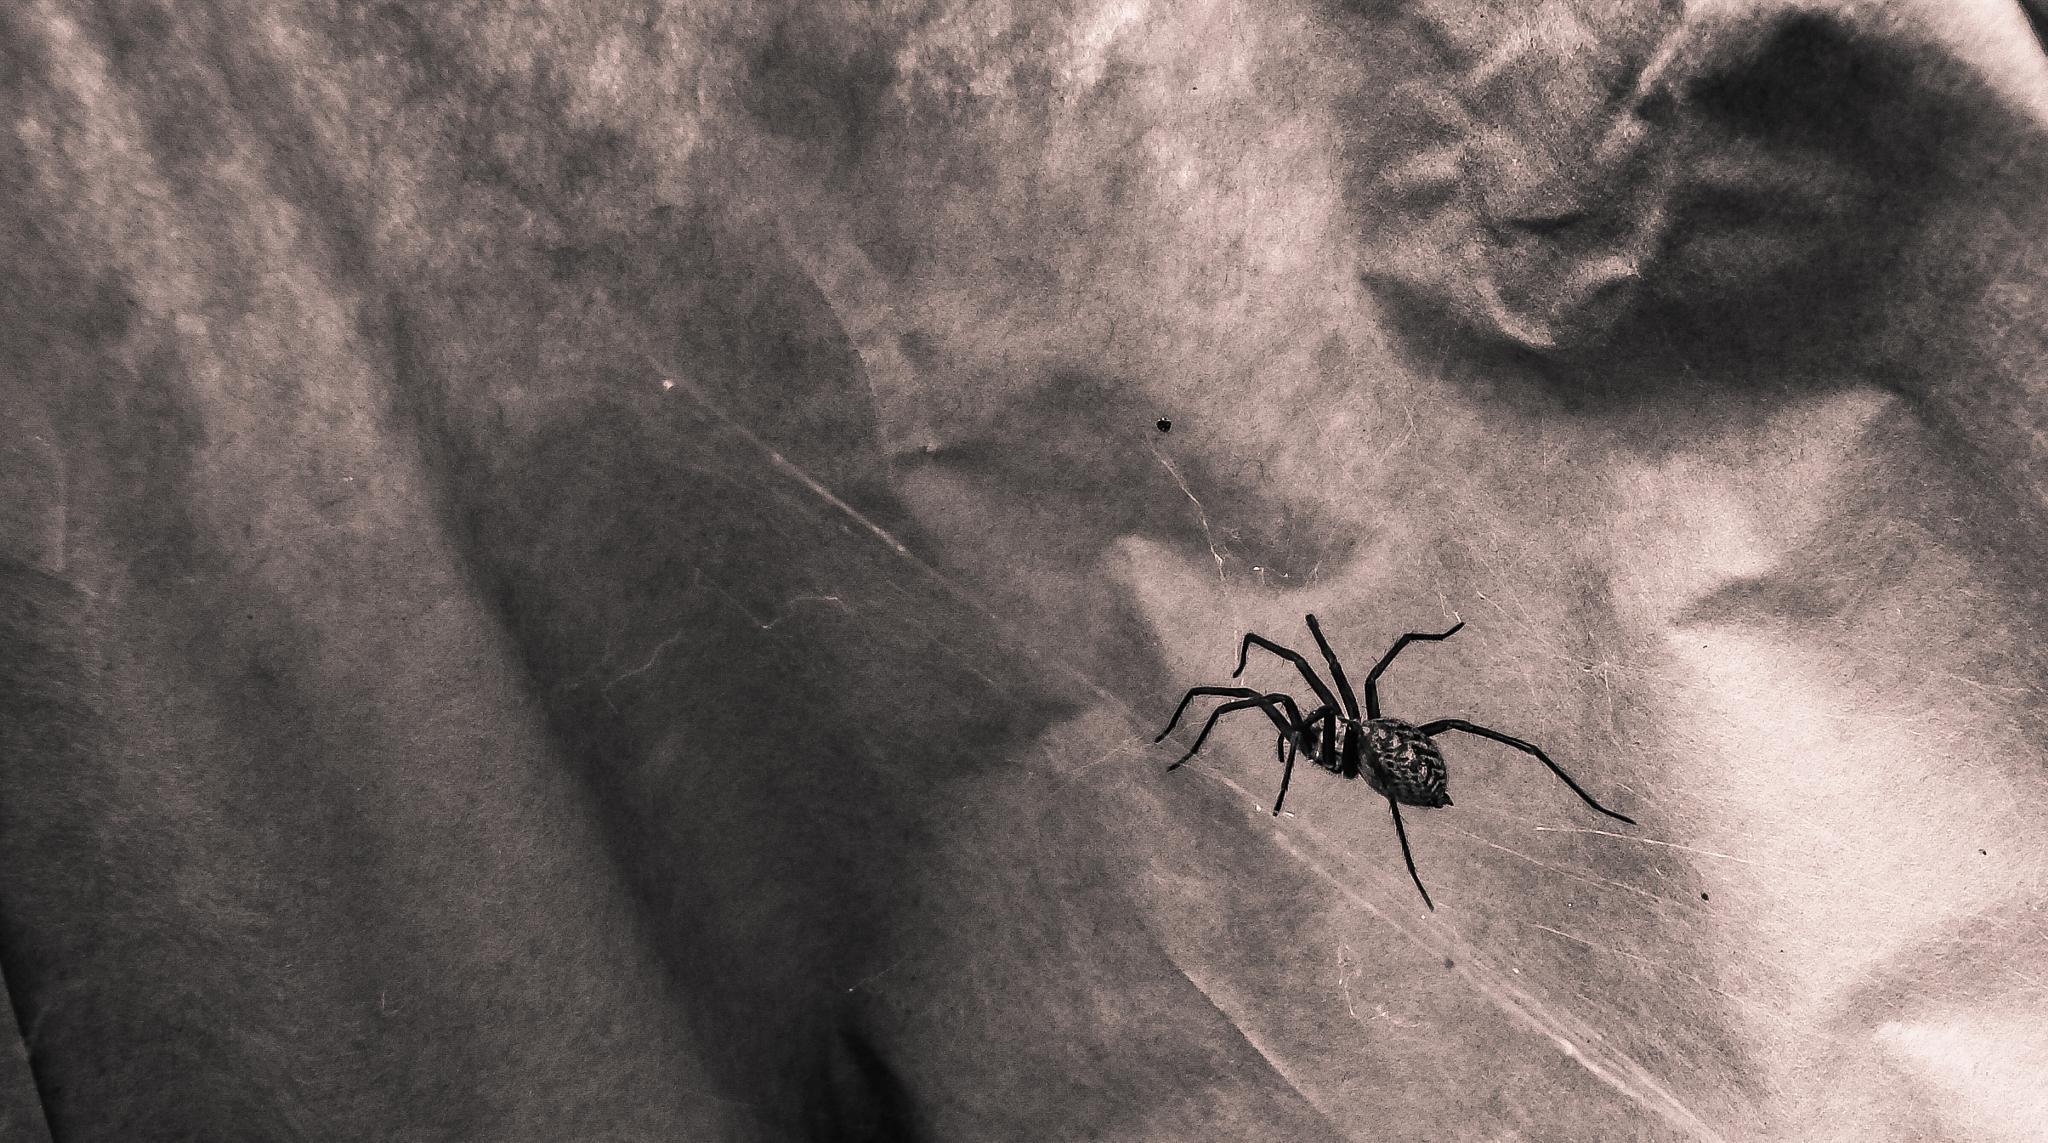 Spider on web by marton.zoltan.96